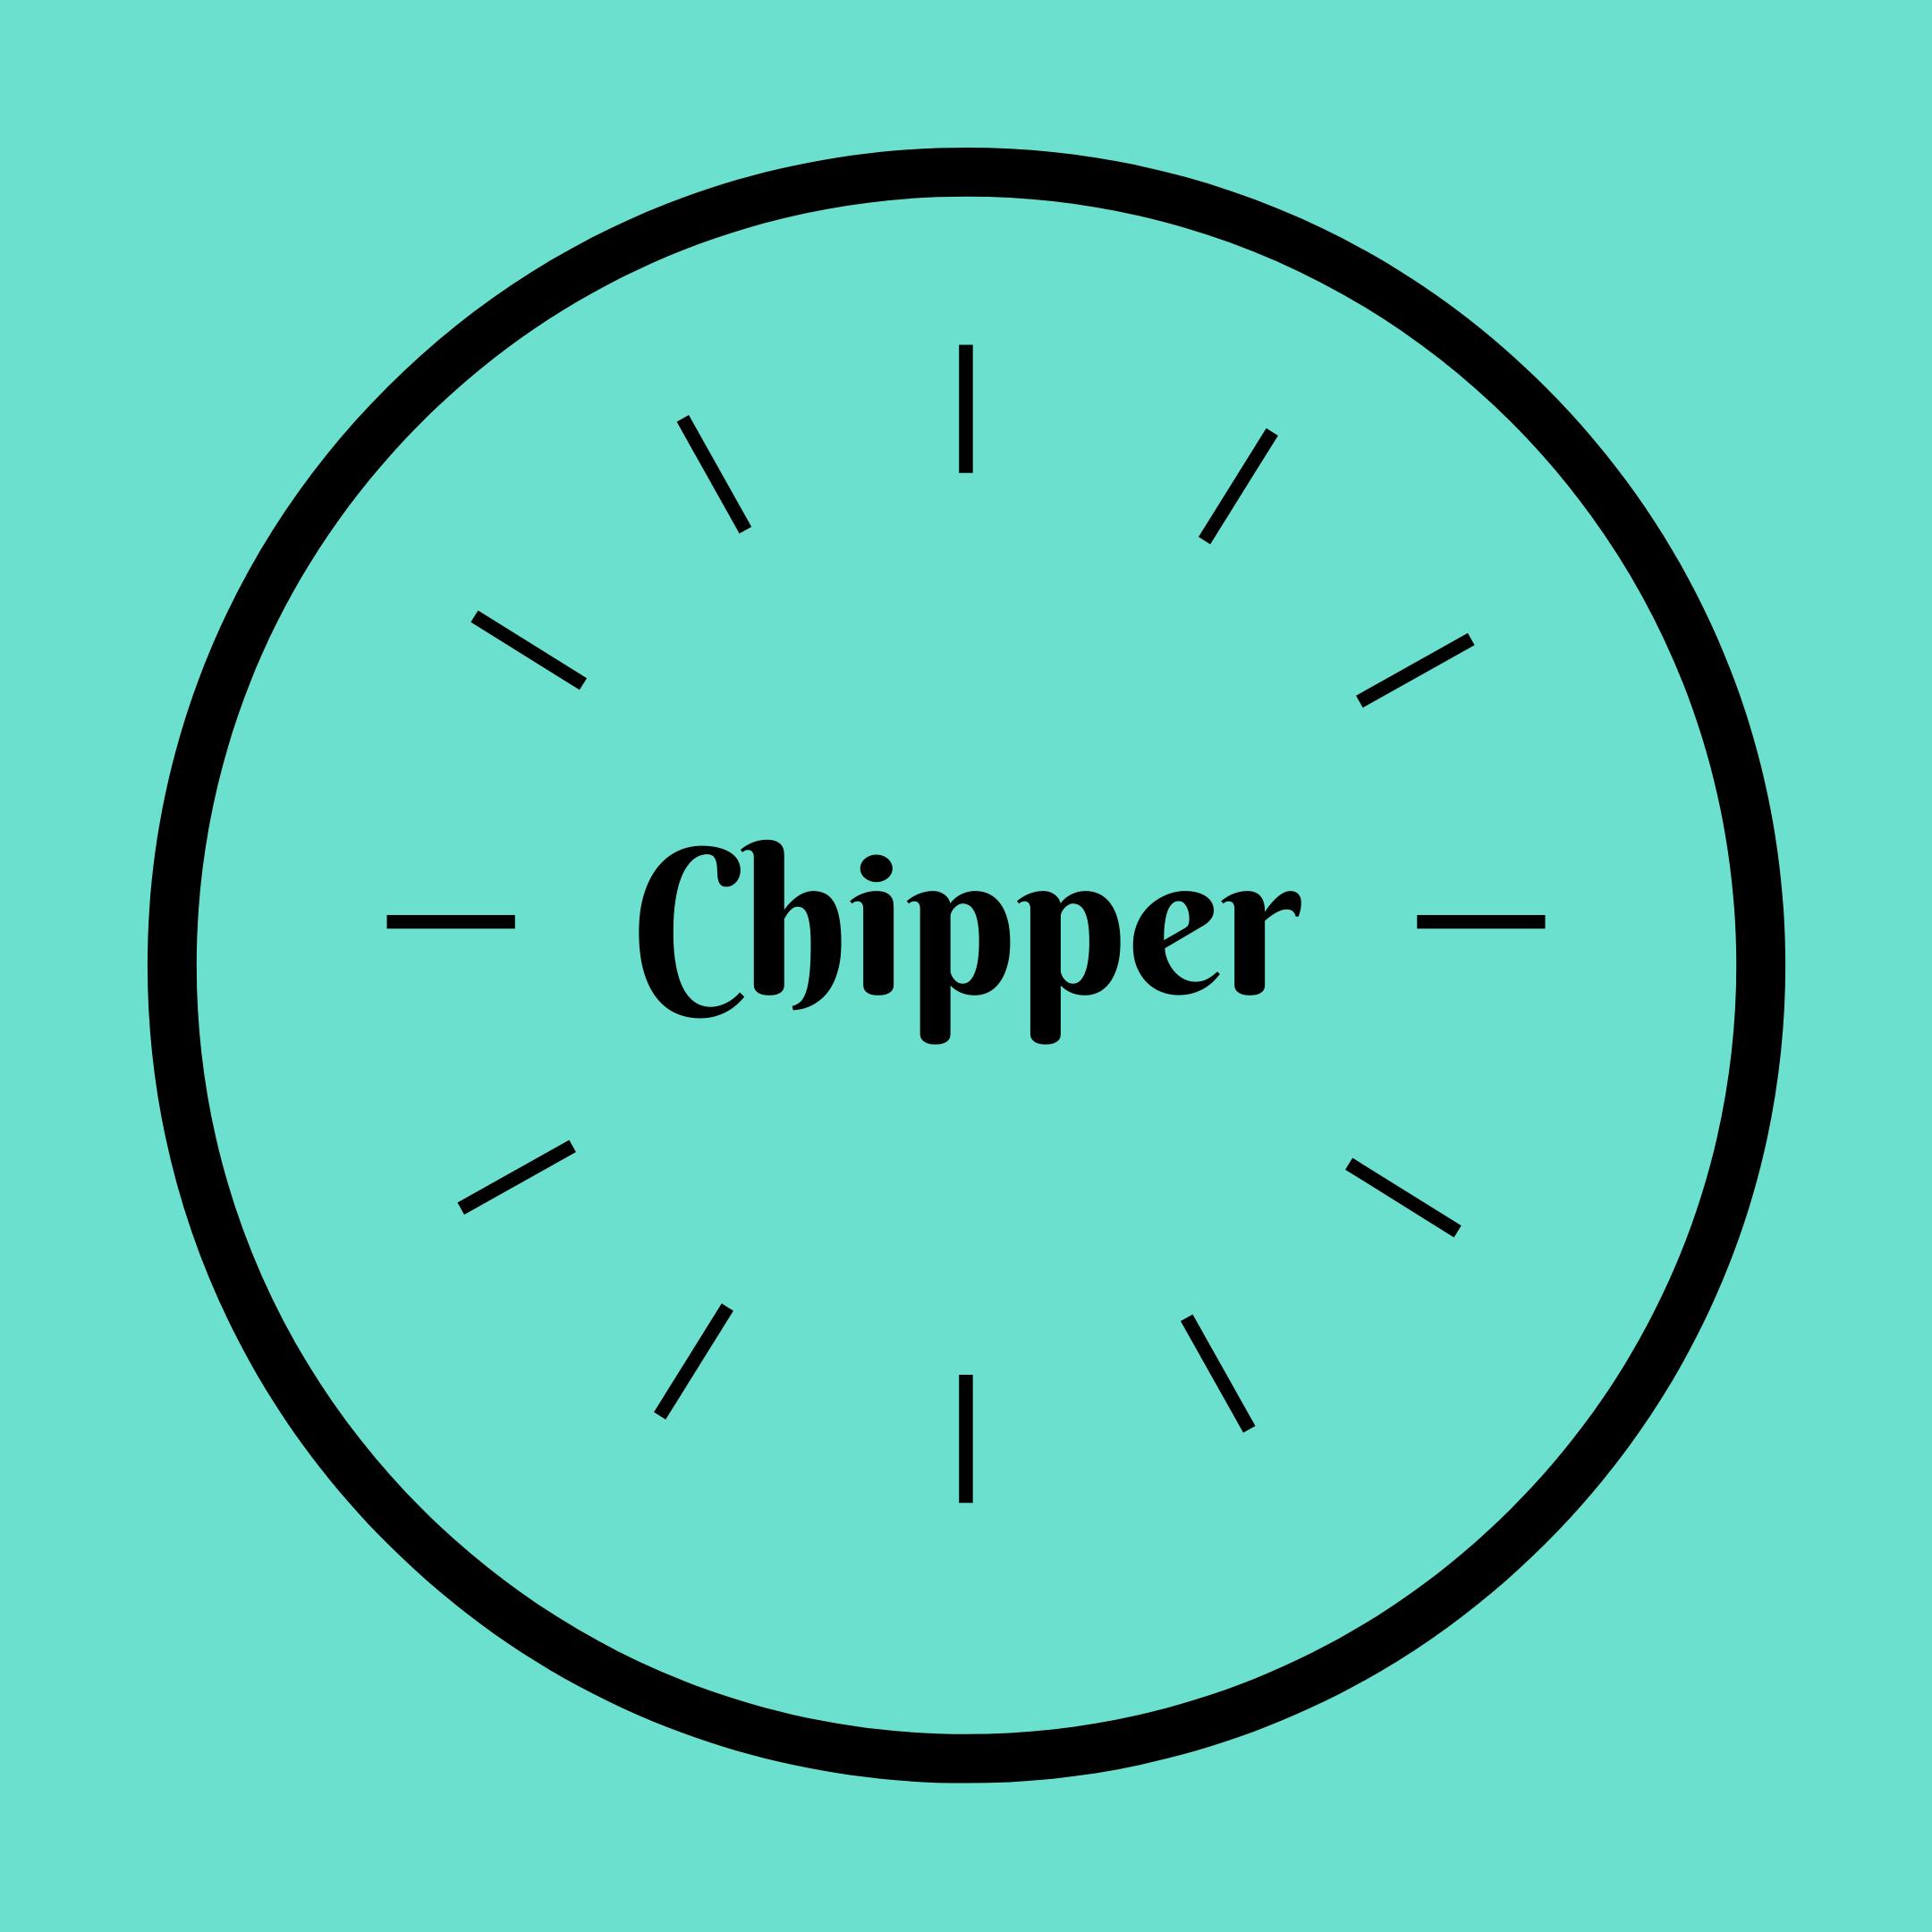 Chipper Tuesday 6am